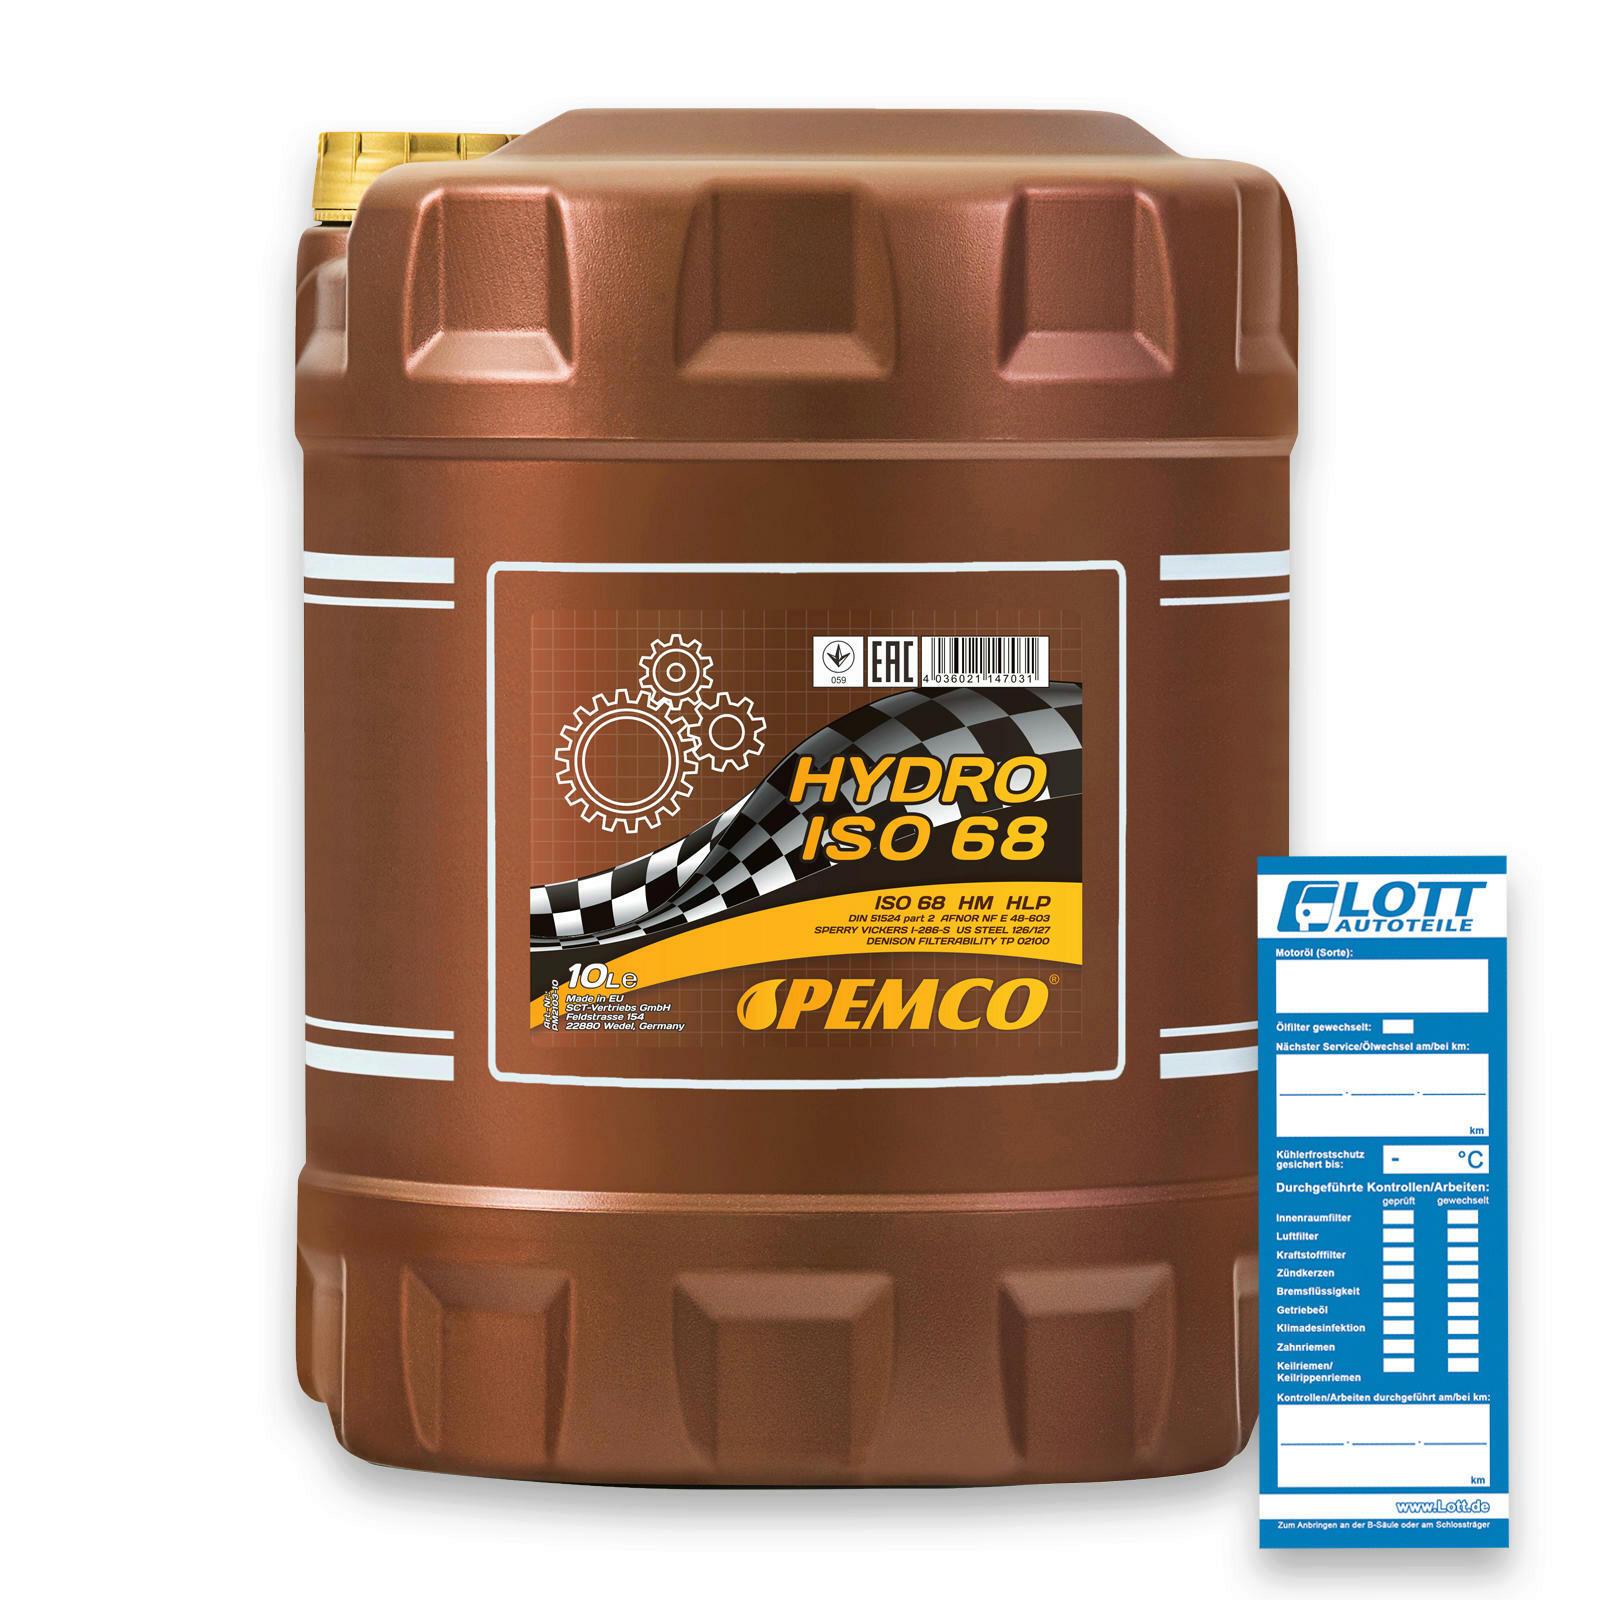 10L Pemco Hydrauliköl ISO 68